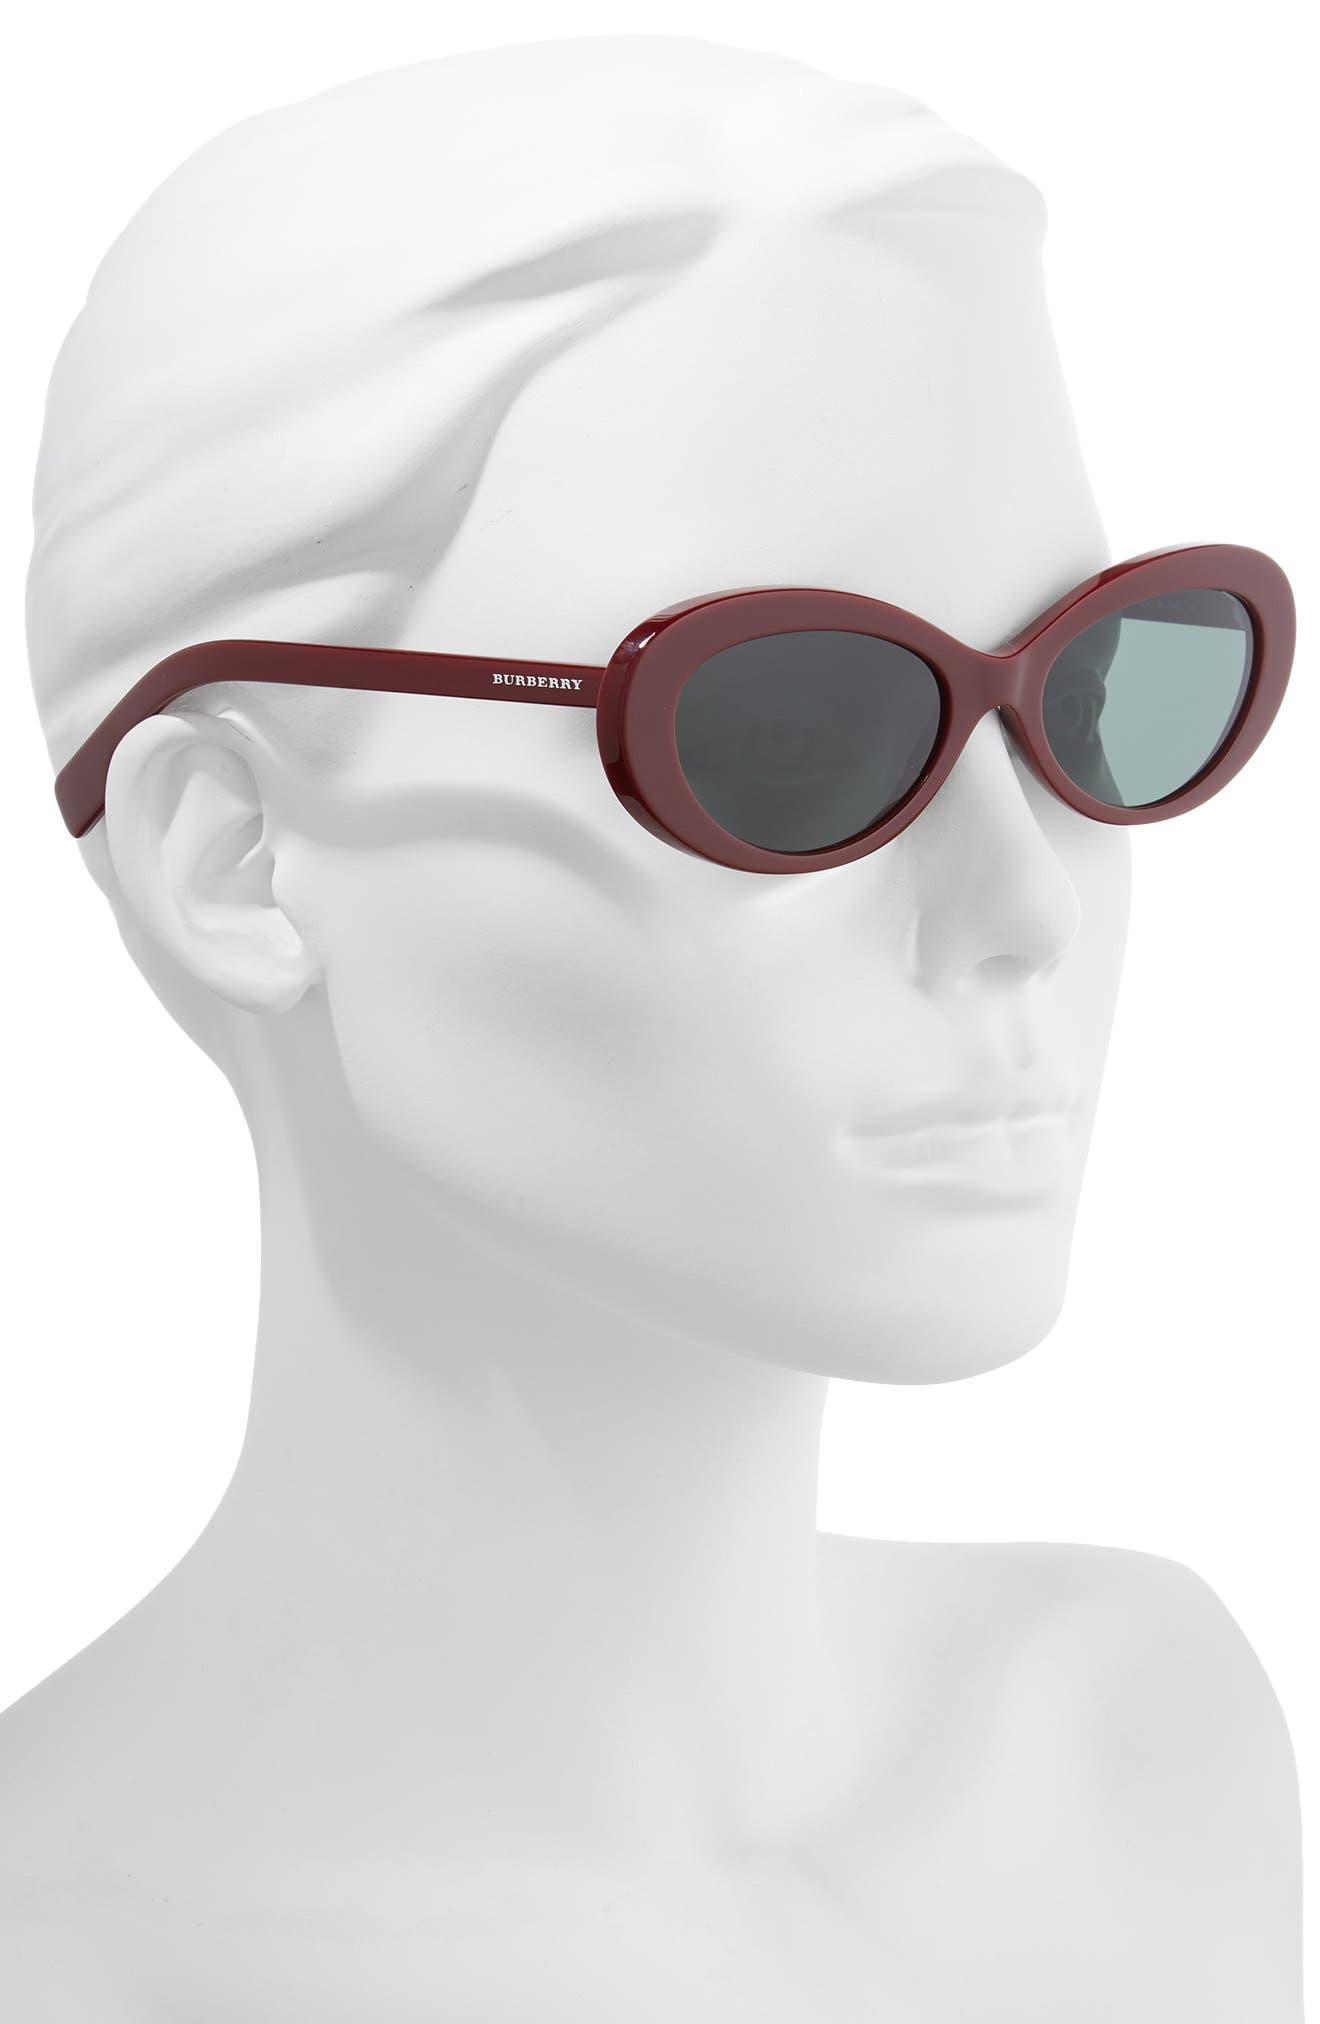 54mm Oval Sunglasses,                             Alternate thumbnail 2, color,                             BORDEAUX SOLID